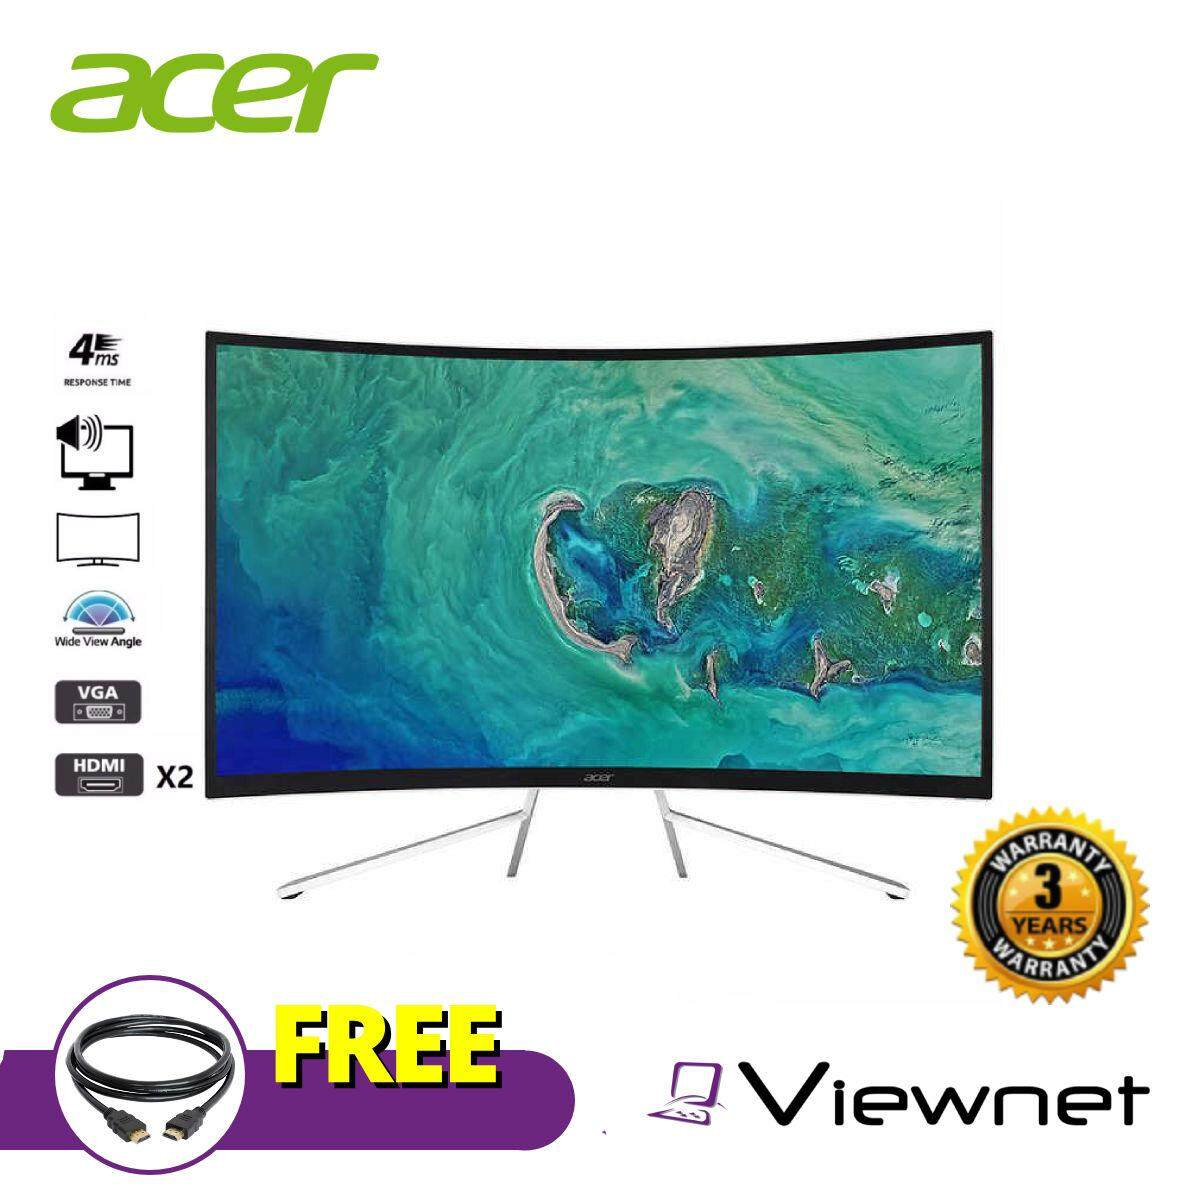 ACER ET322QR Curved FreeSync 75hz 31.5 FHD Monitor Malaysia